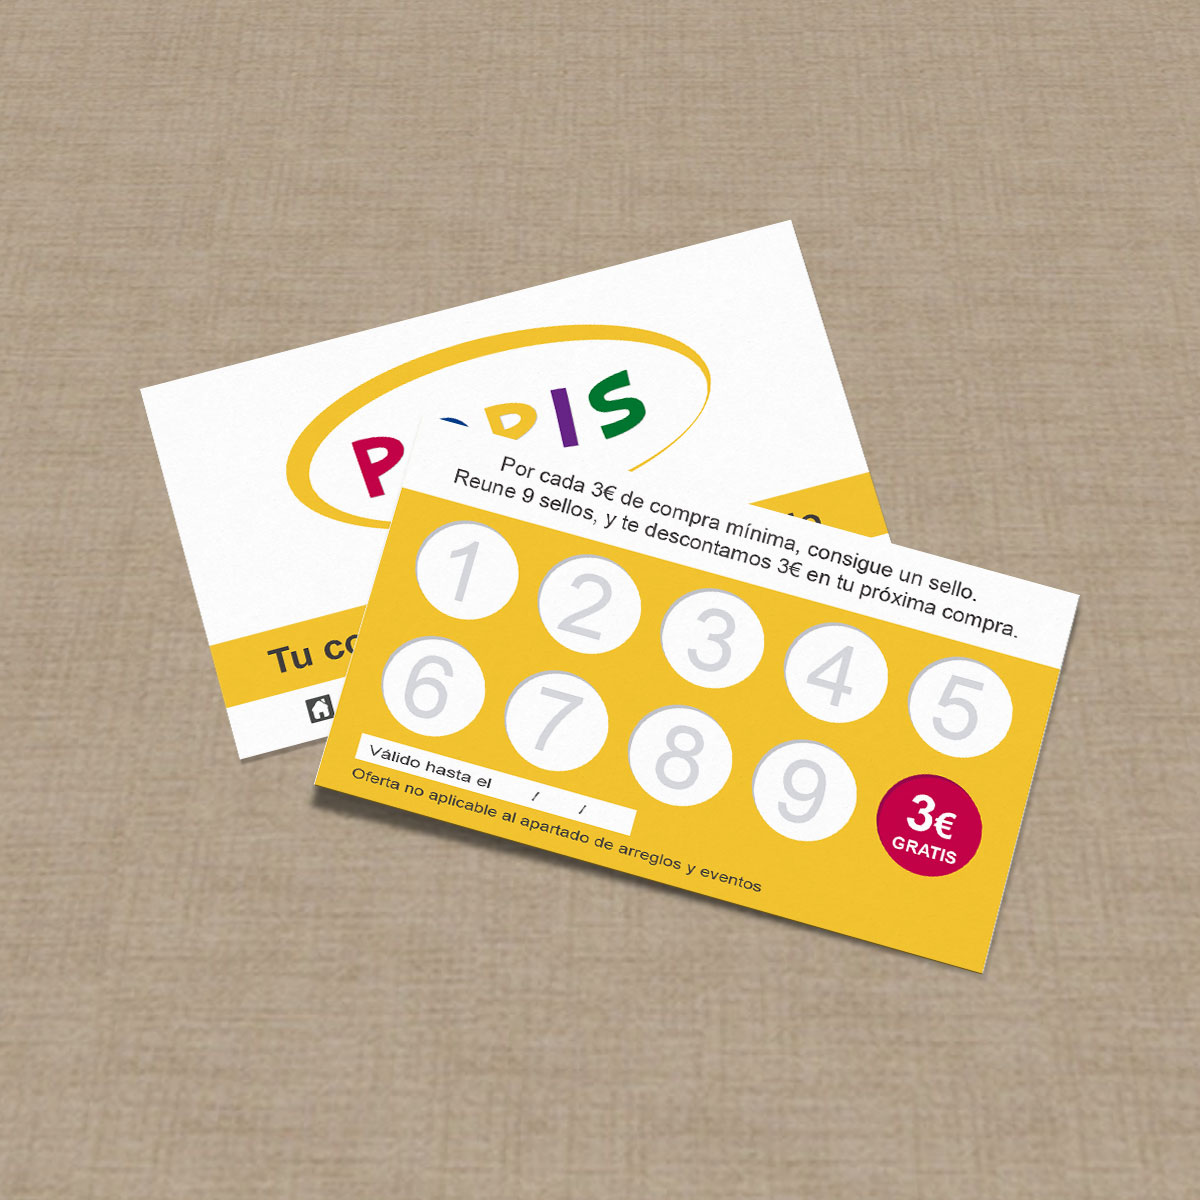 Dise o de tarjetas de fidelizaci n de clientes popis - Disenos para tarjetas ...